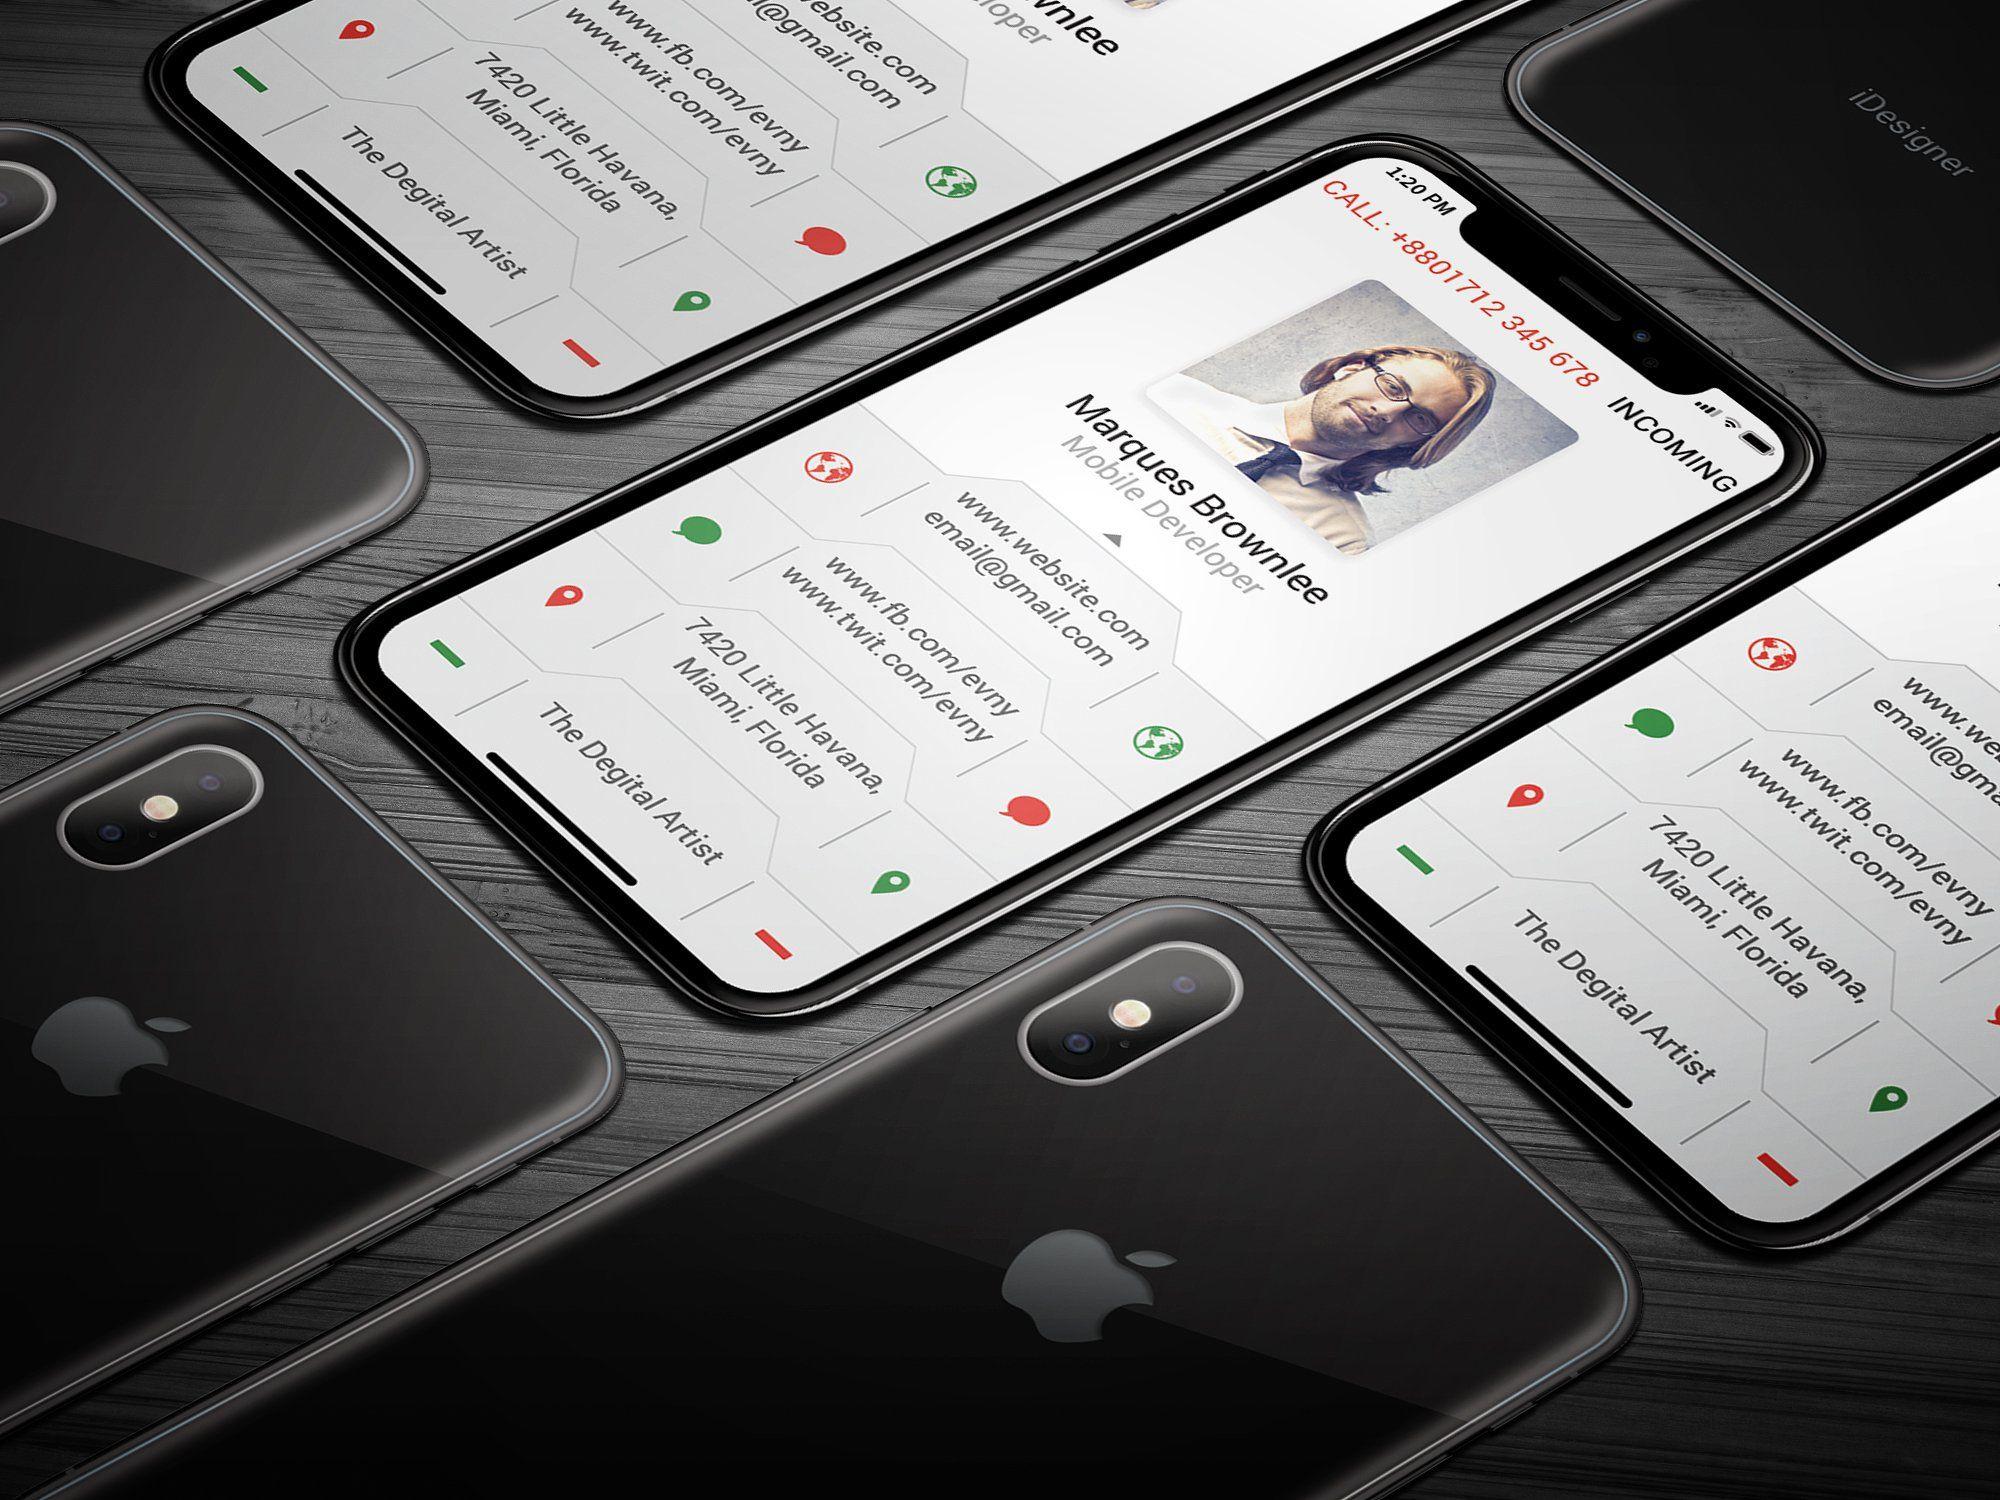 Iphone X Business Card #bleed#dpi#li#features | Business Inside Iphone Business Card Template